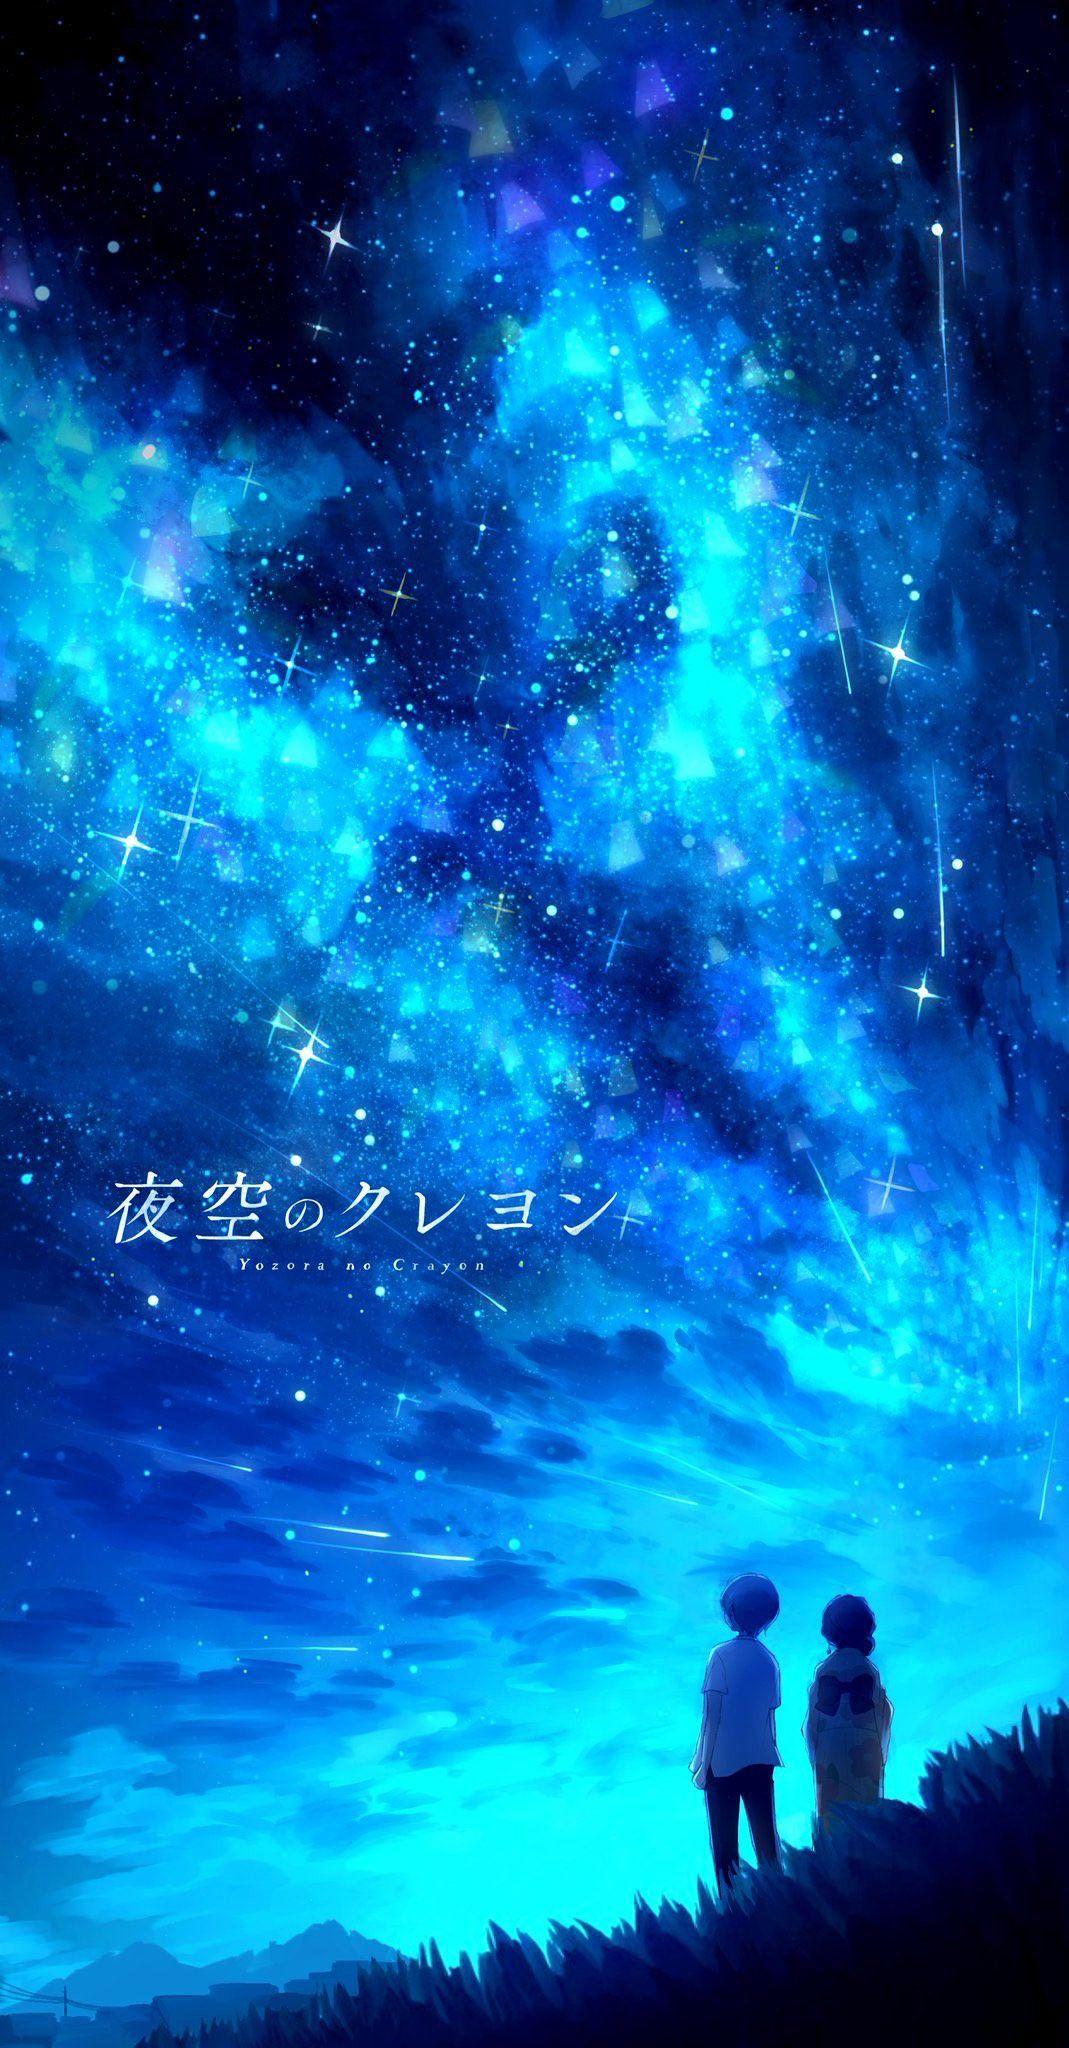 Pin oleh Nayla Aulia di まふまふ♥️ di 2020 Langit malam